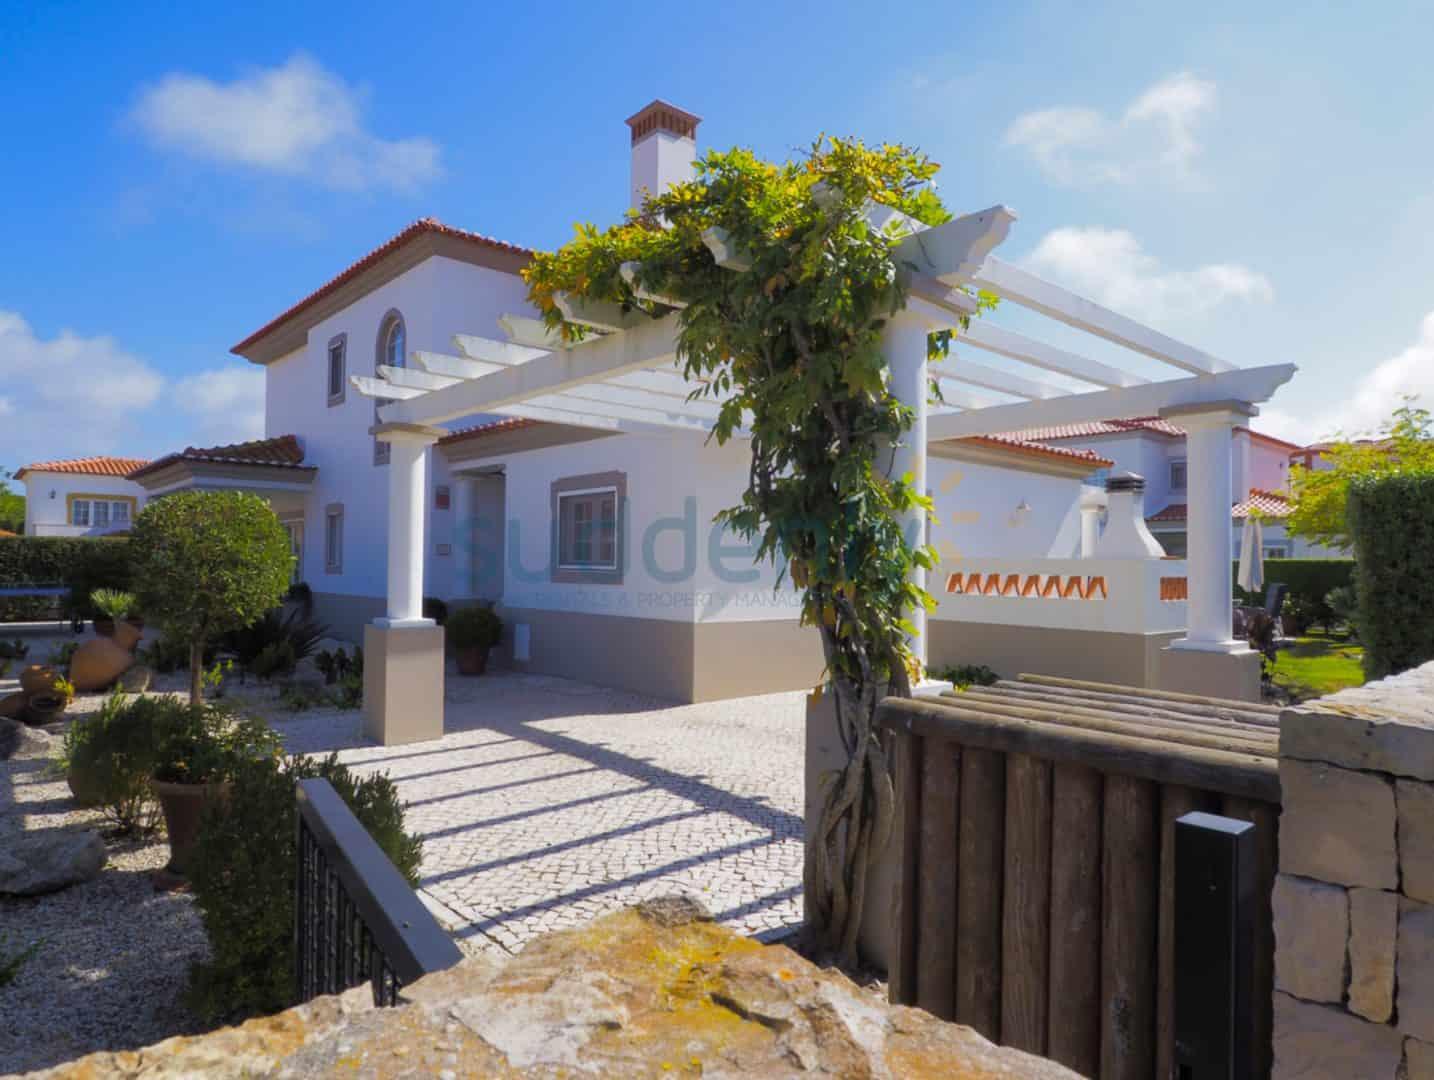 Aluguer de Férias na Praia D'El Rey 308